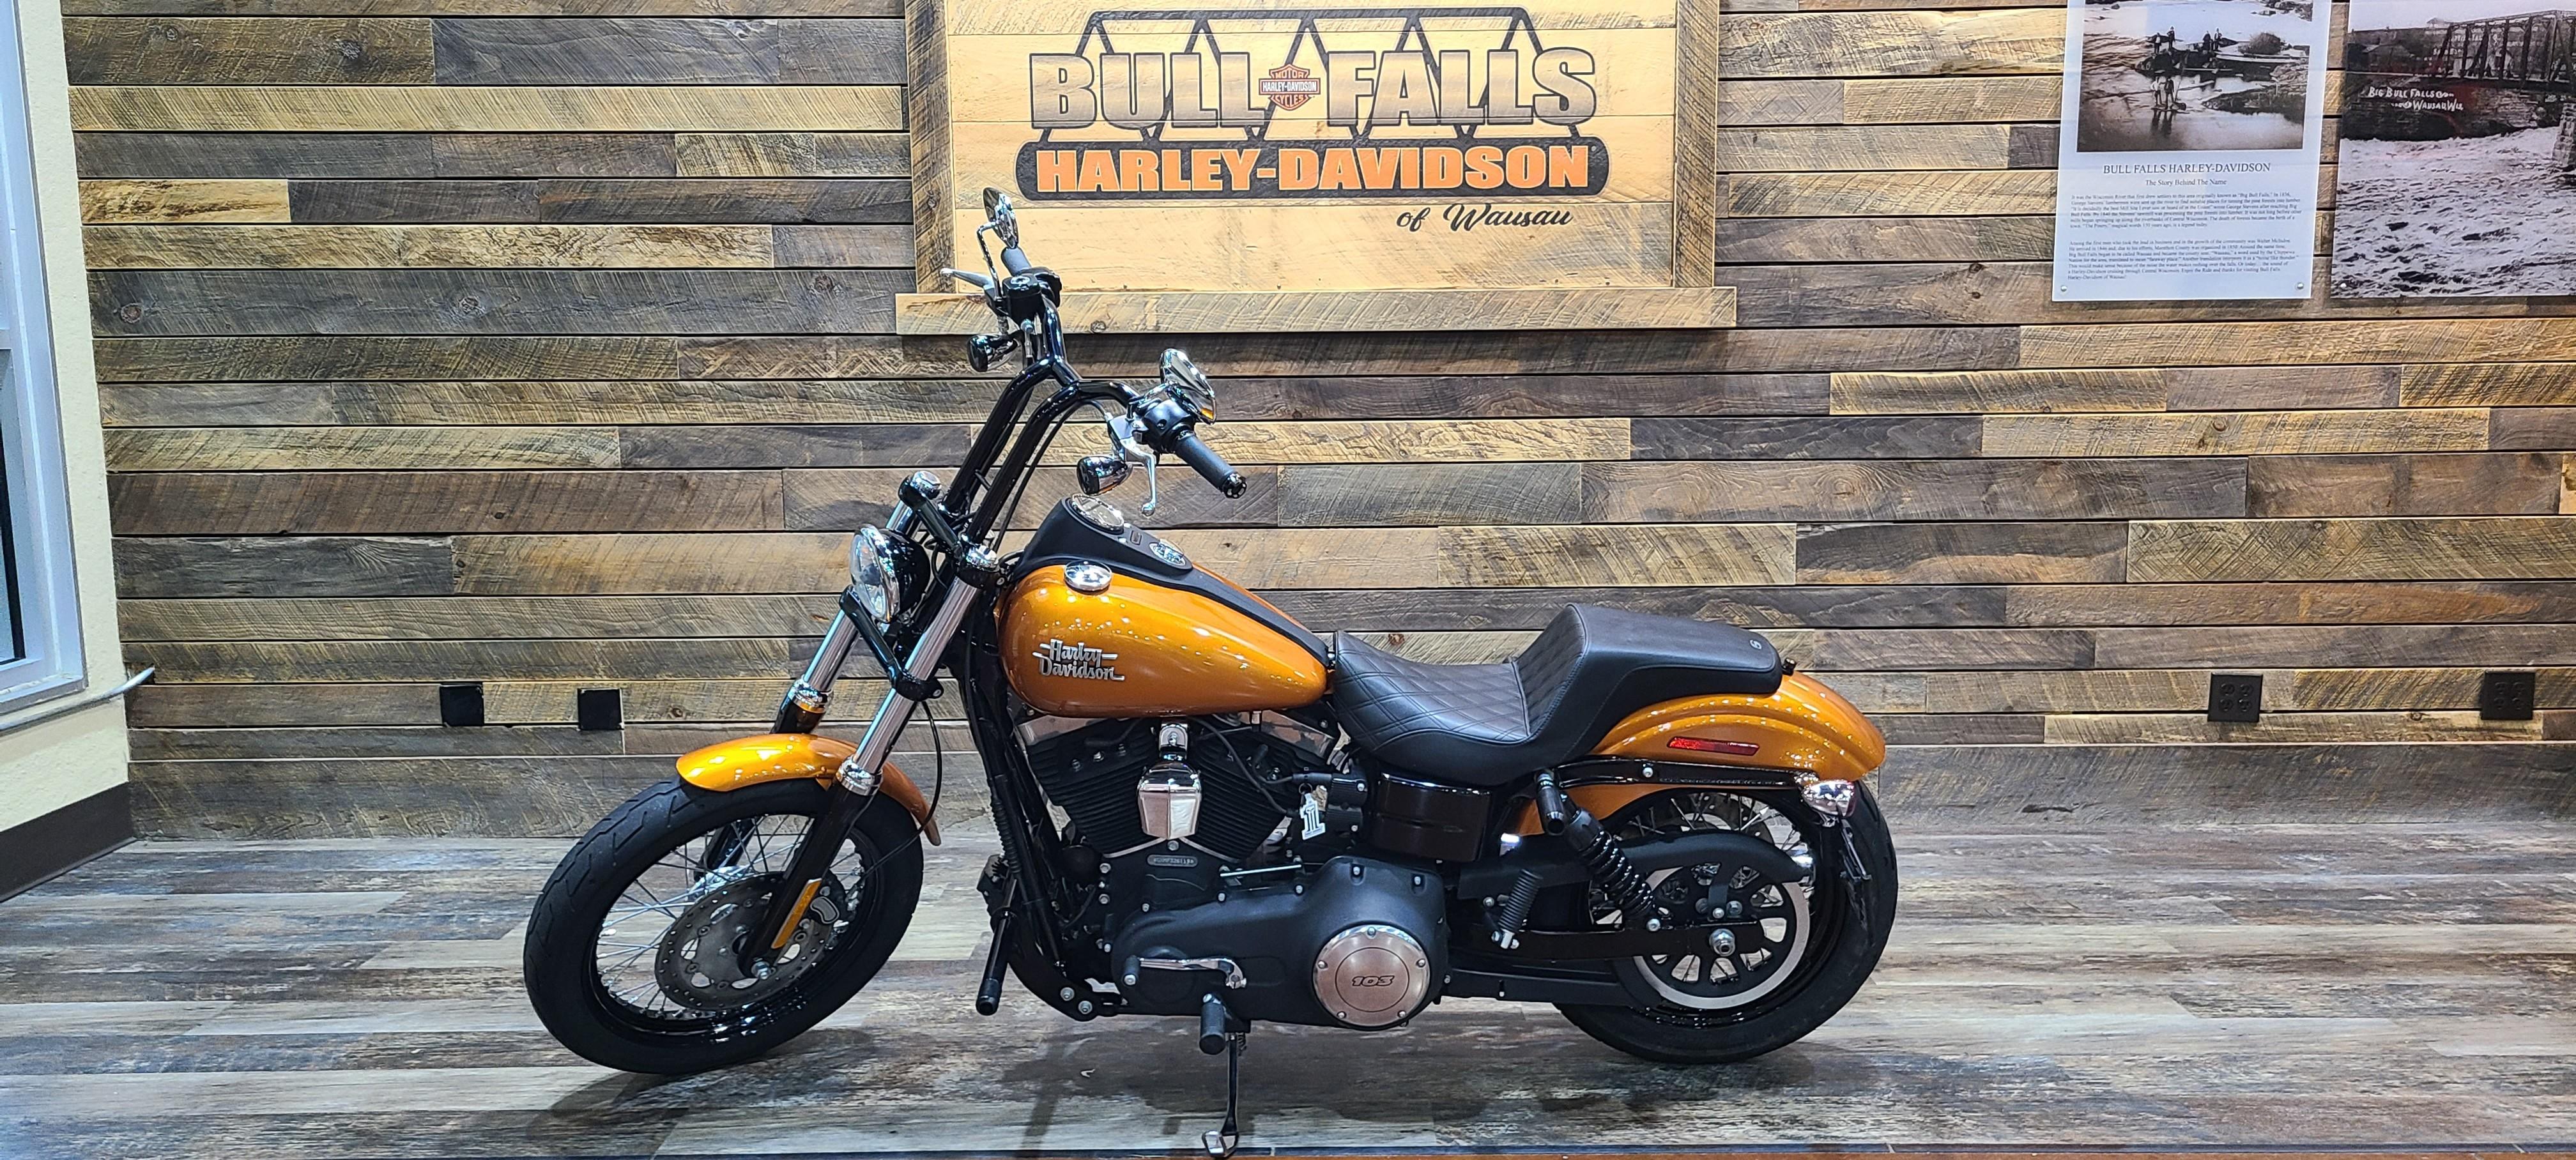 2015 Harley-Davidson Dyna Street Bob at Bull Falls Harley-Davidson